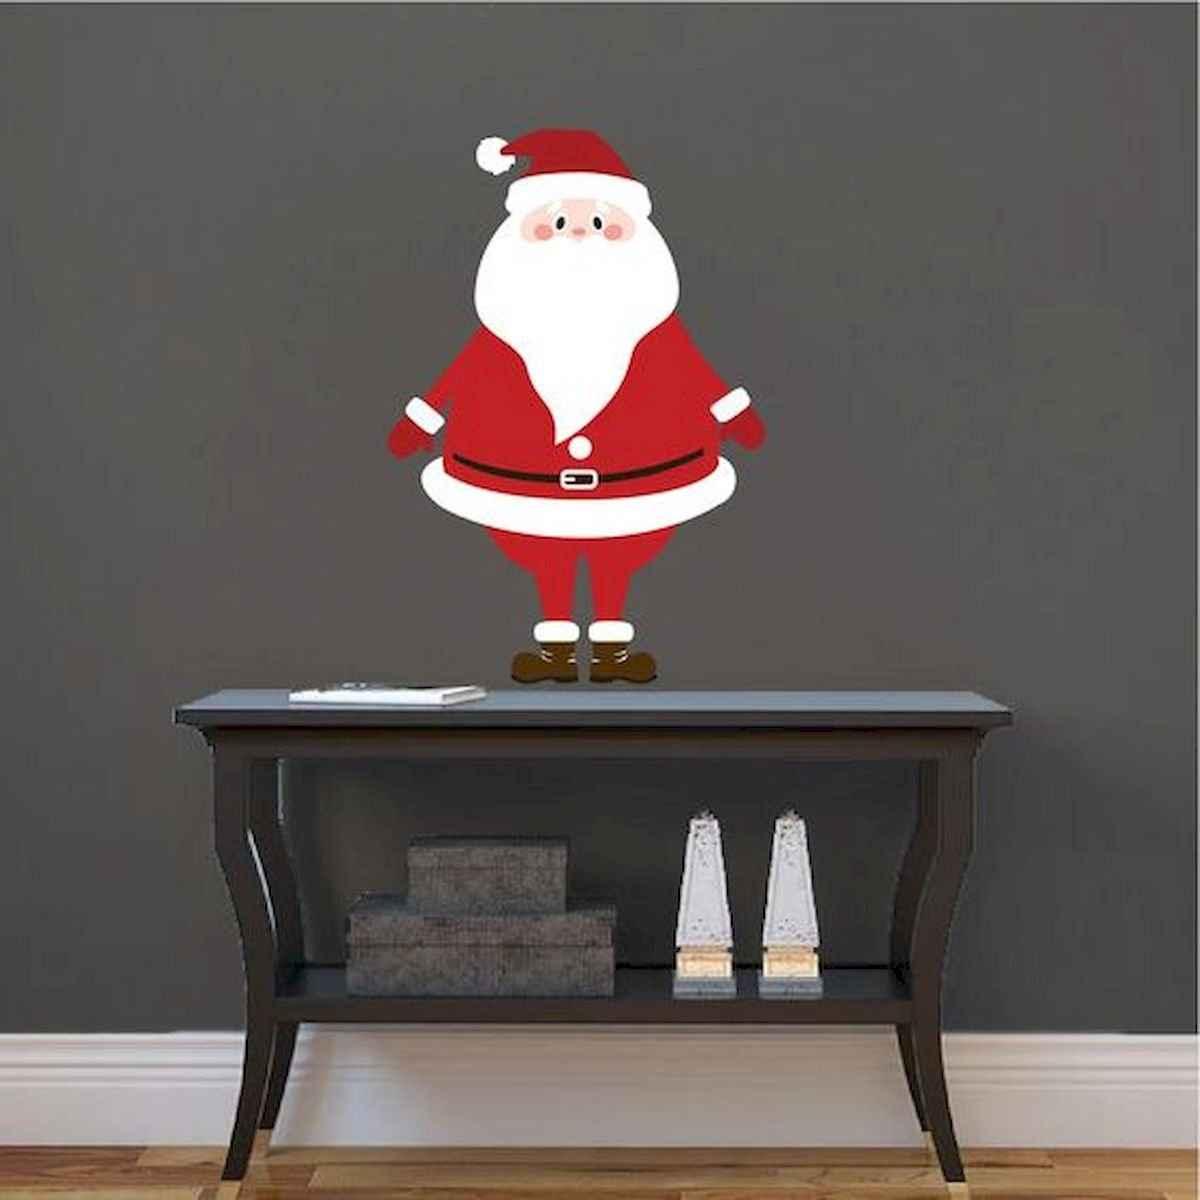 35 Awesome Apartment Christmas Decor Ideas (33)